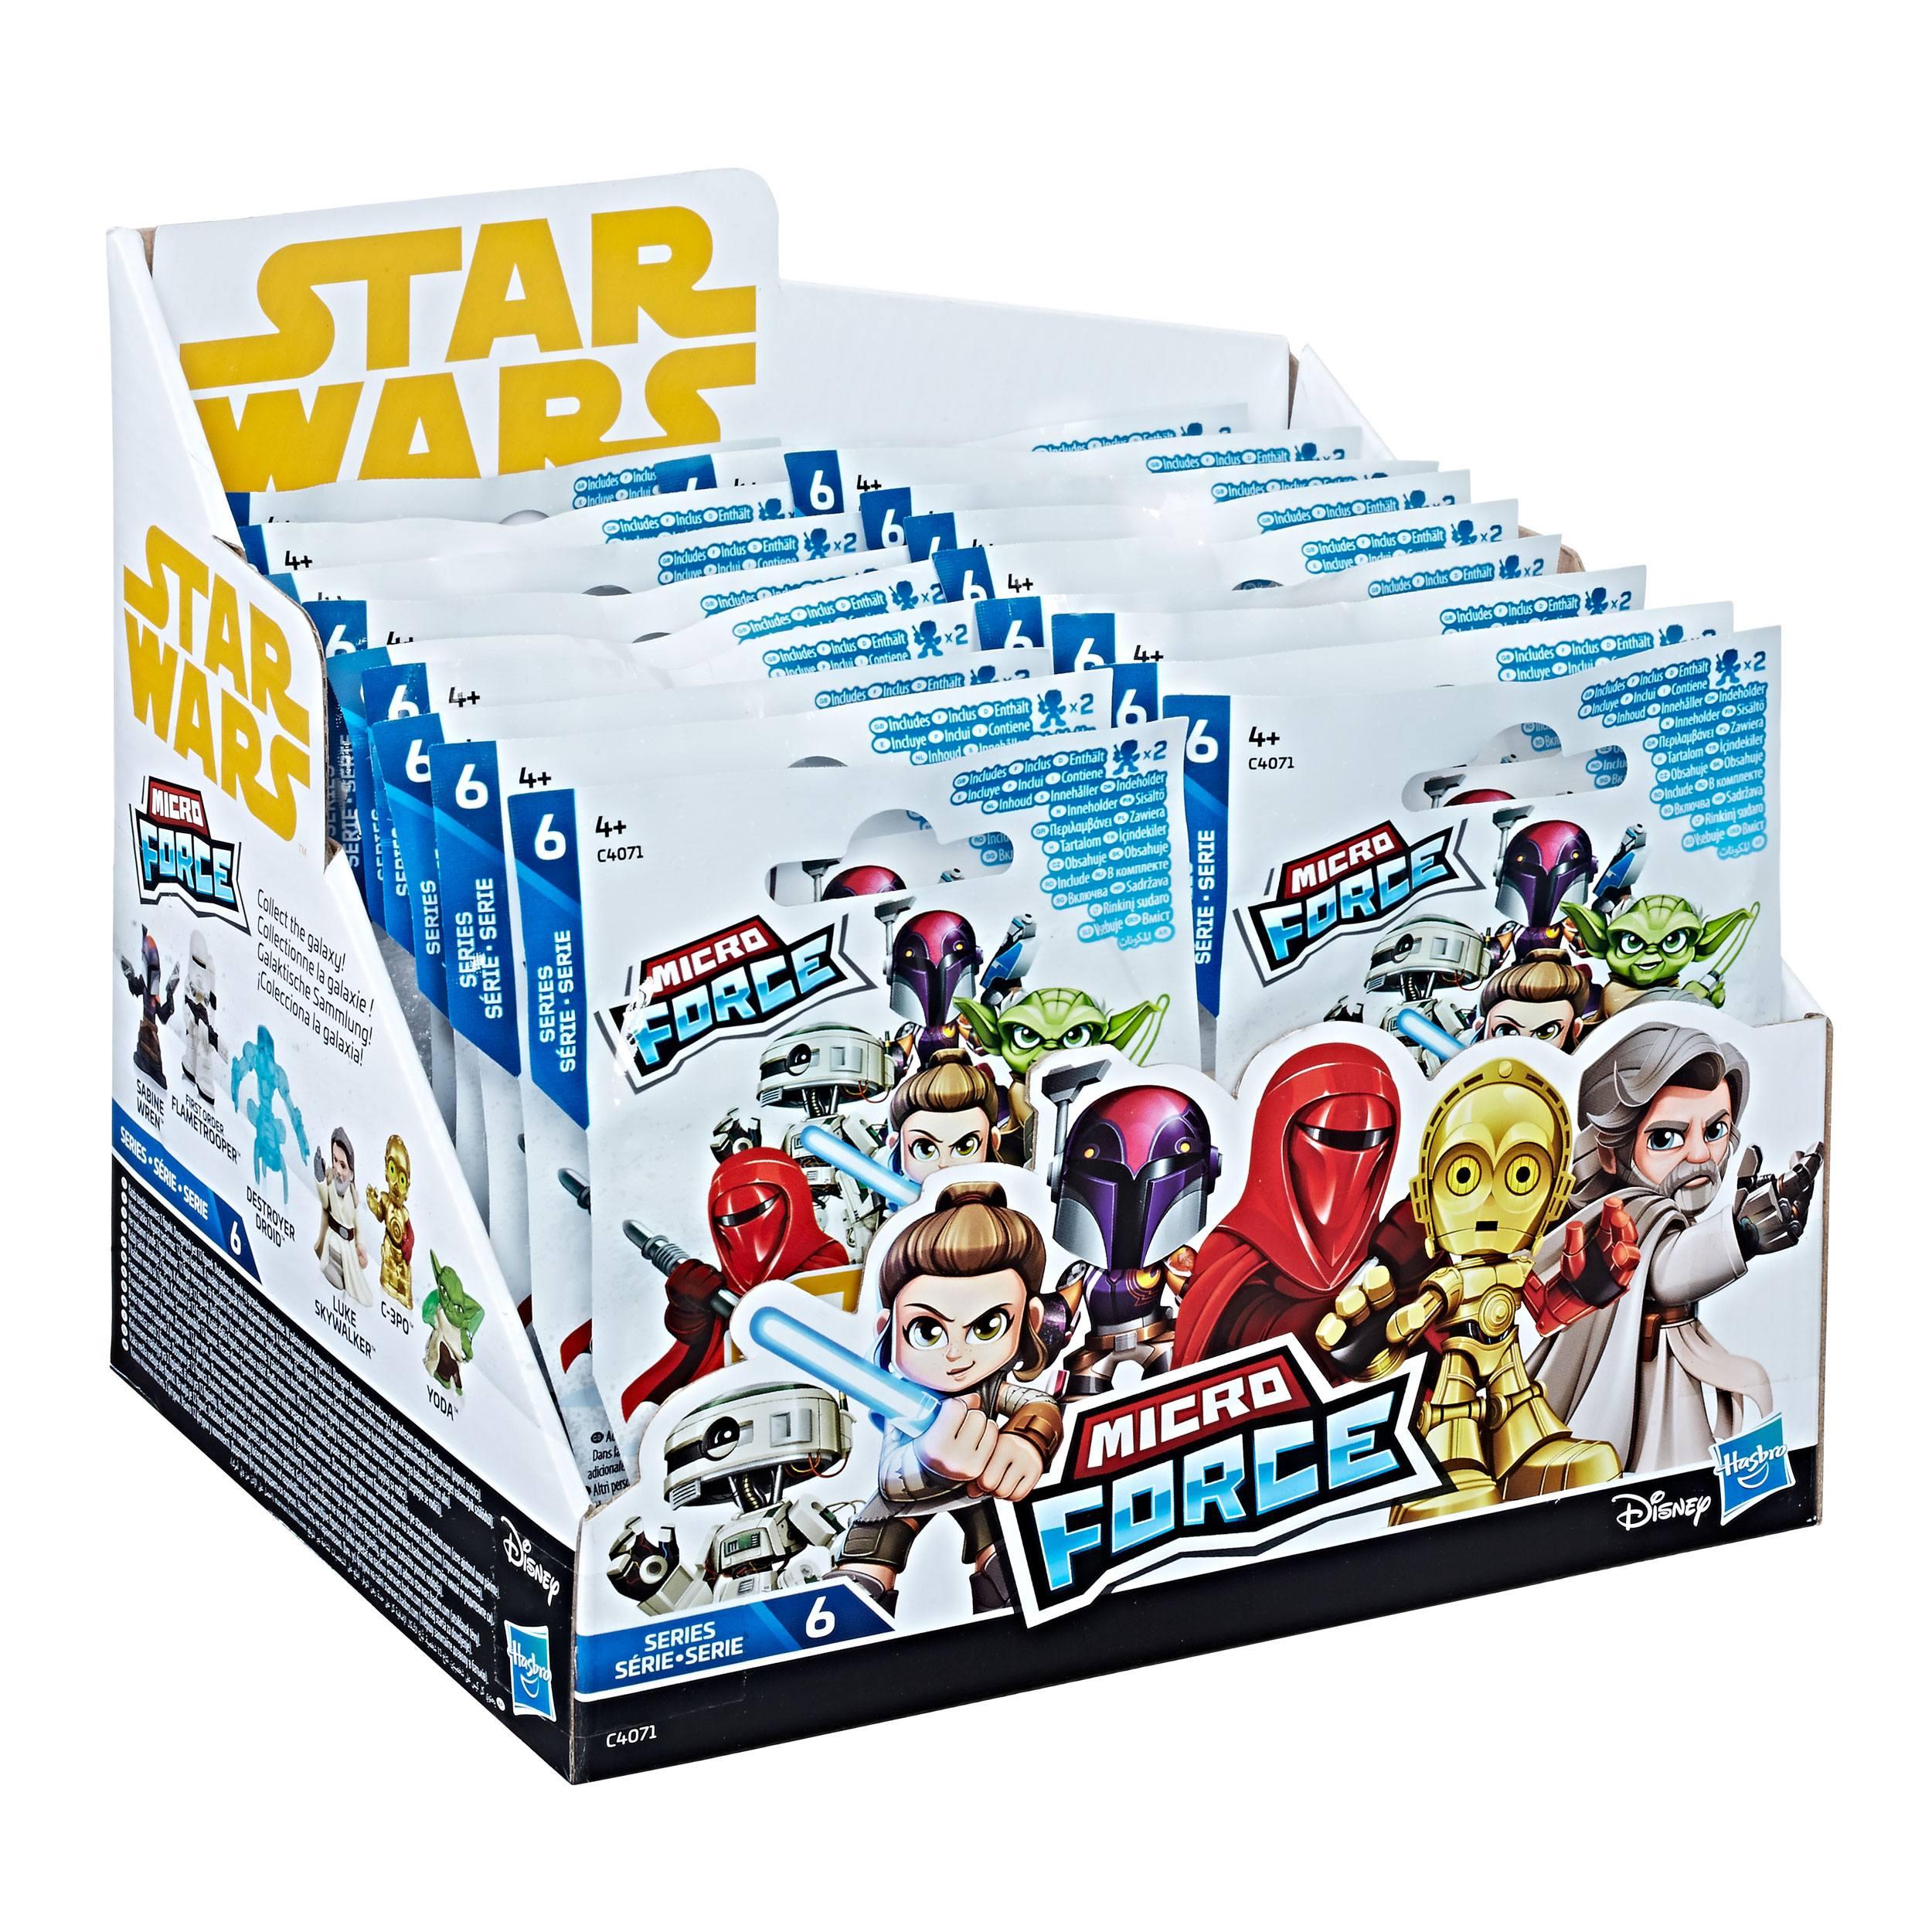 Star Wars Micro Force Mini Figures Blind Bags 2018 Series